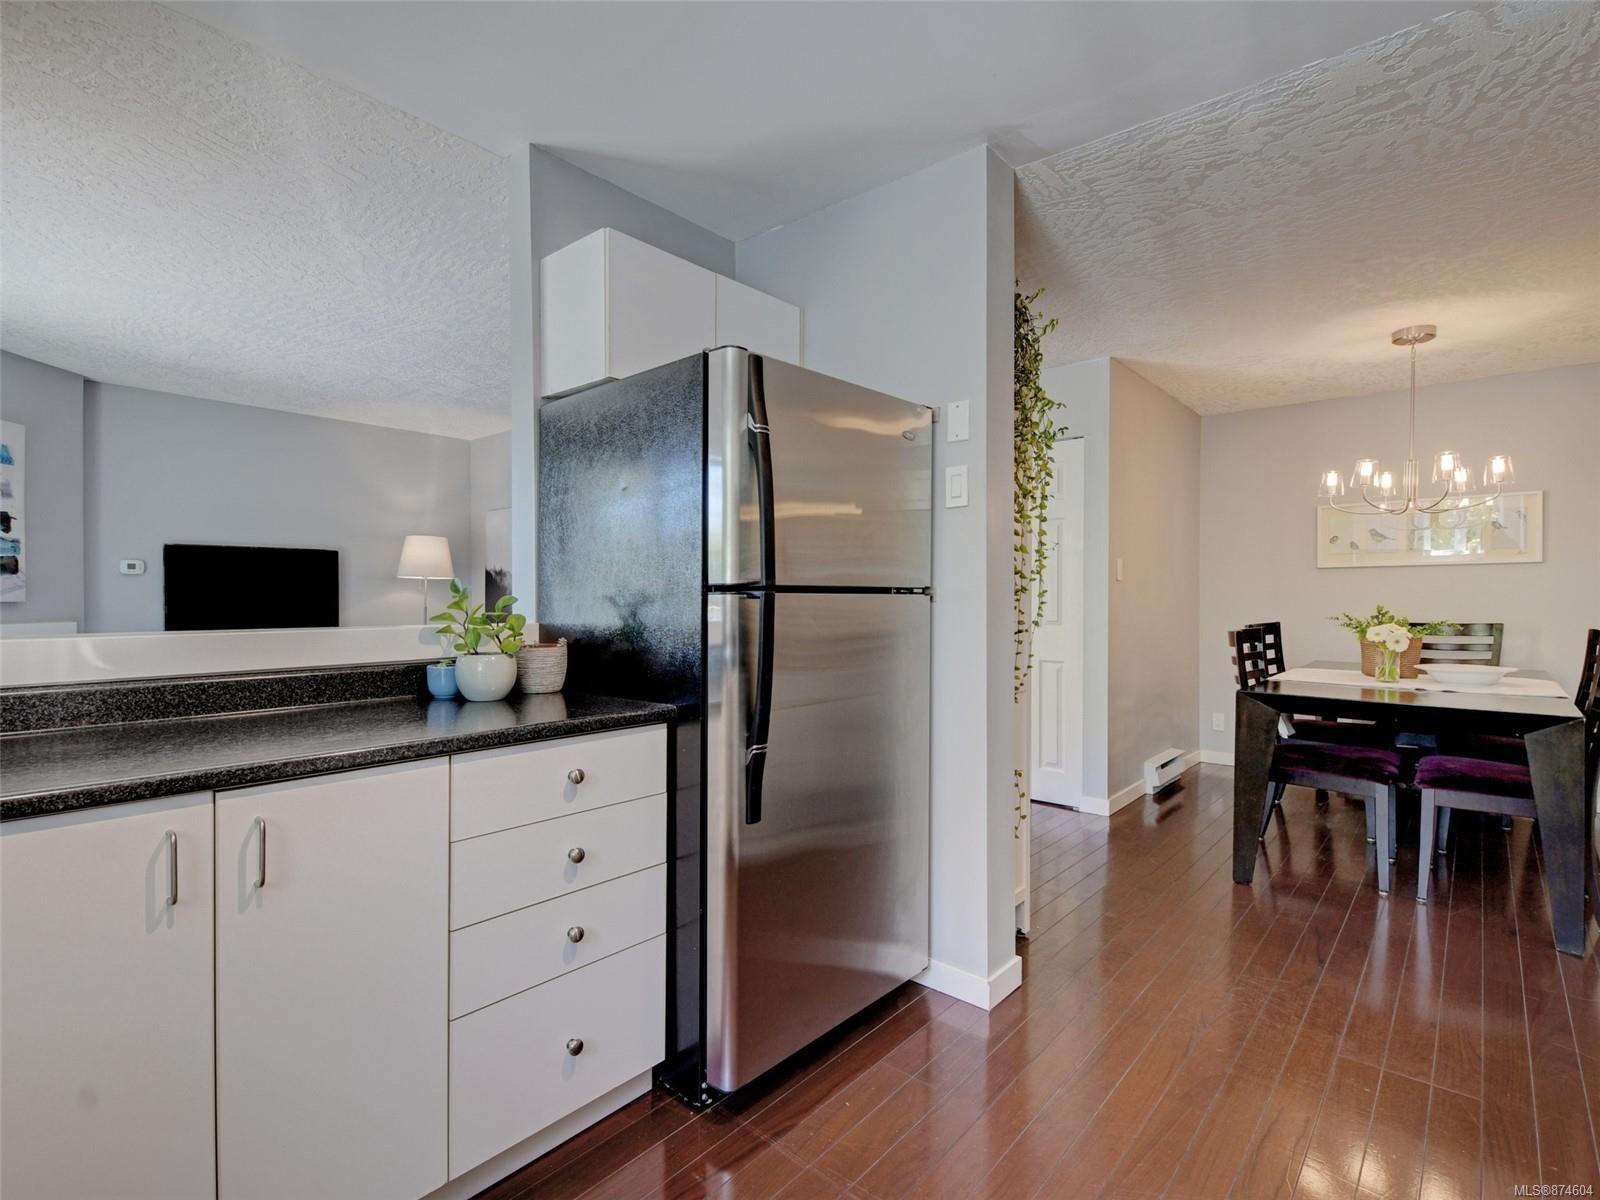 Photo 8: Photos: 202 2710 Grosvenor Rd in : Vi Oaklands Condo for sale (Victoria)  : MLS®# 874604